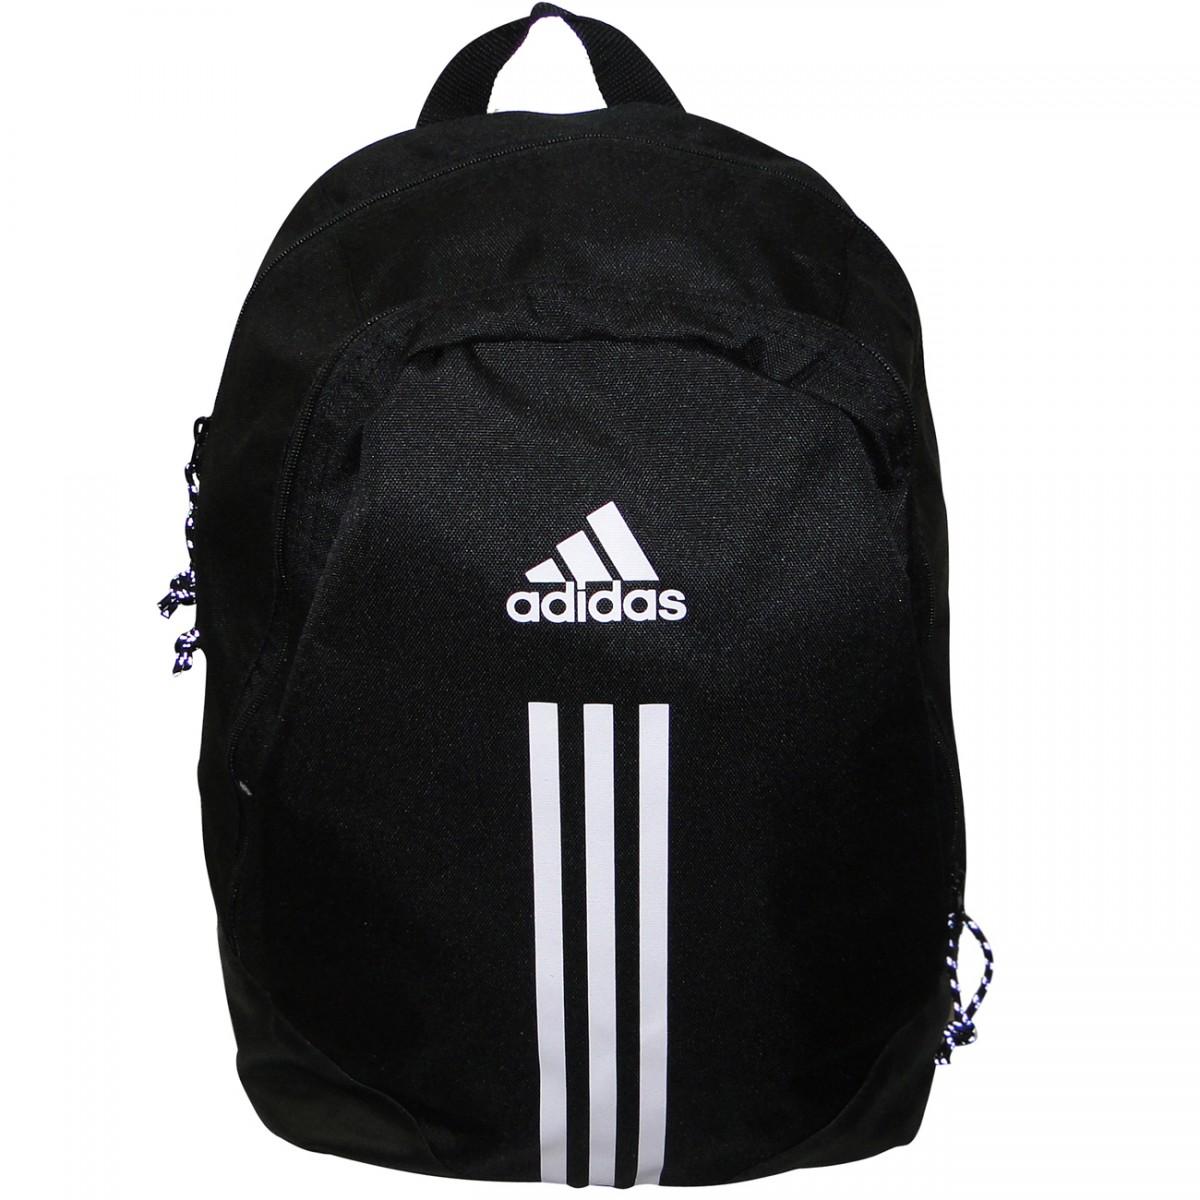 new release los angeles super quality Mochila Adidas Ref.v86916